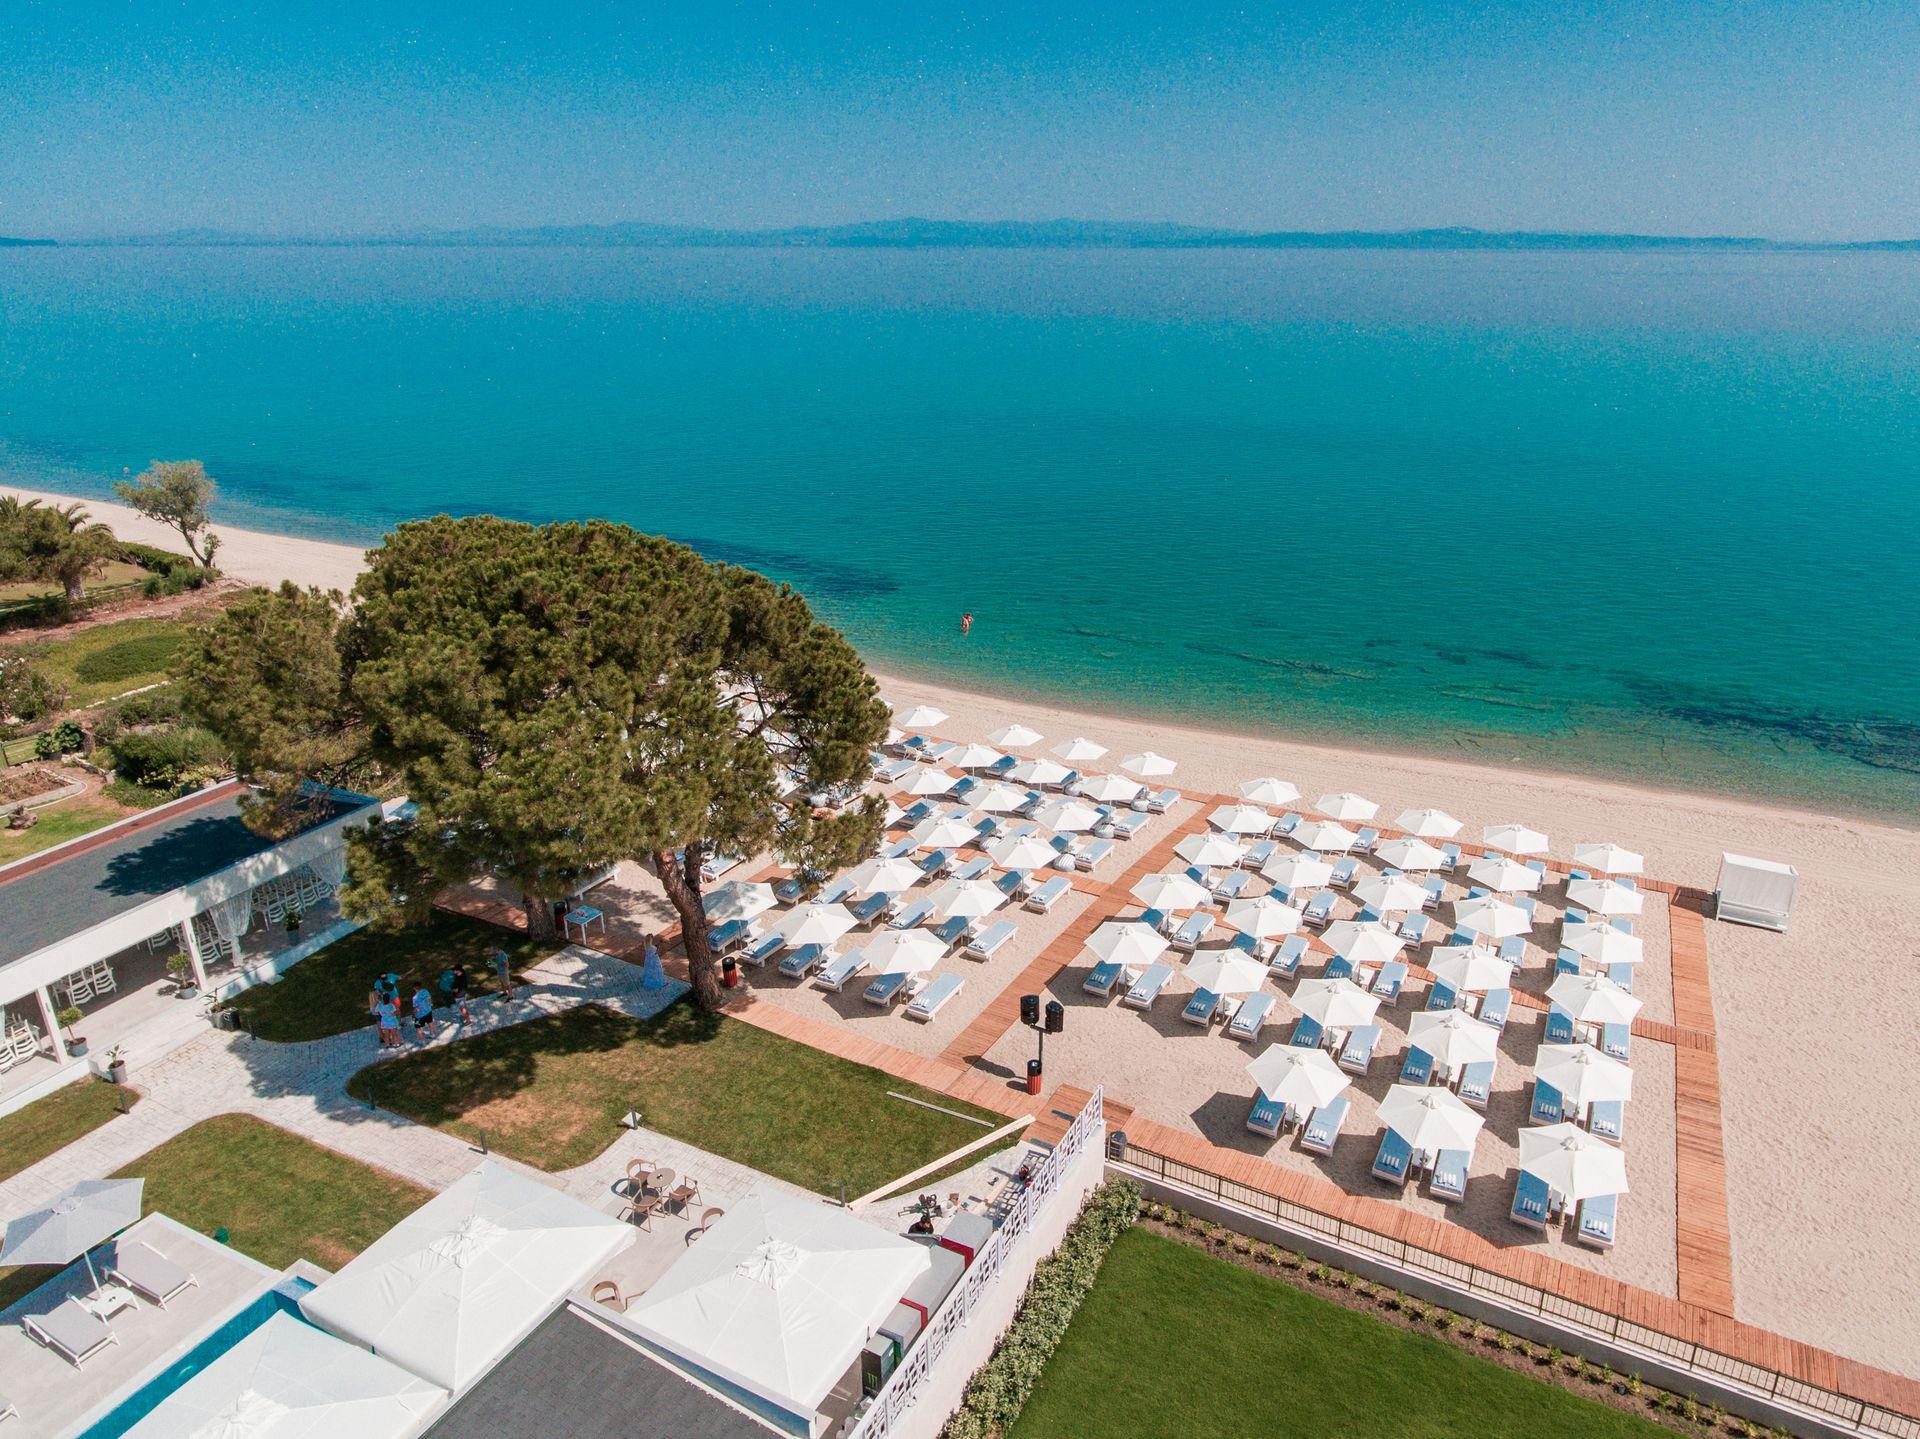 Laguna Resort - Χανιώτη, Χαλκιδική ✦ 6 Ημέρες (5 Διανυκτερεύσεις) ✦ 2 άτομα + 1 παιδί έως 11 ετών ✦ Πρωινό ✦ 01/07/2021 έως 31/07/2021 ✦ Μπροστά στην Παραλία!